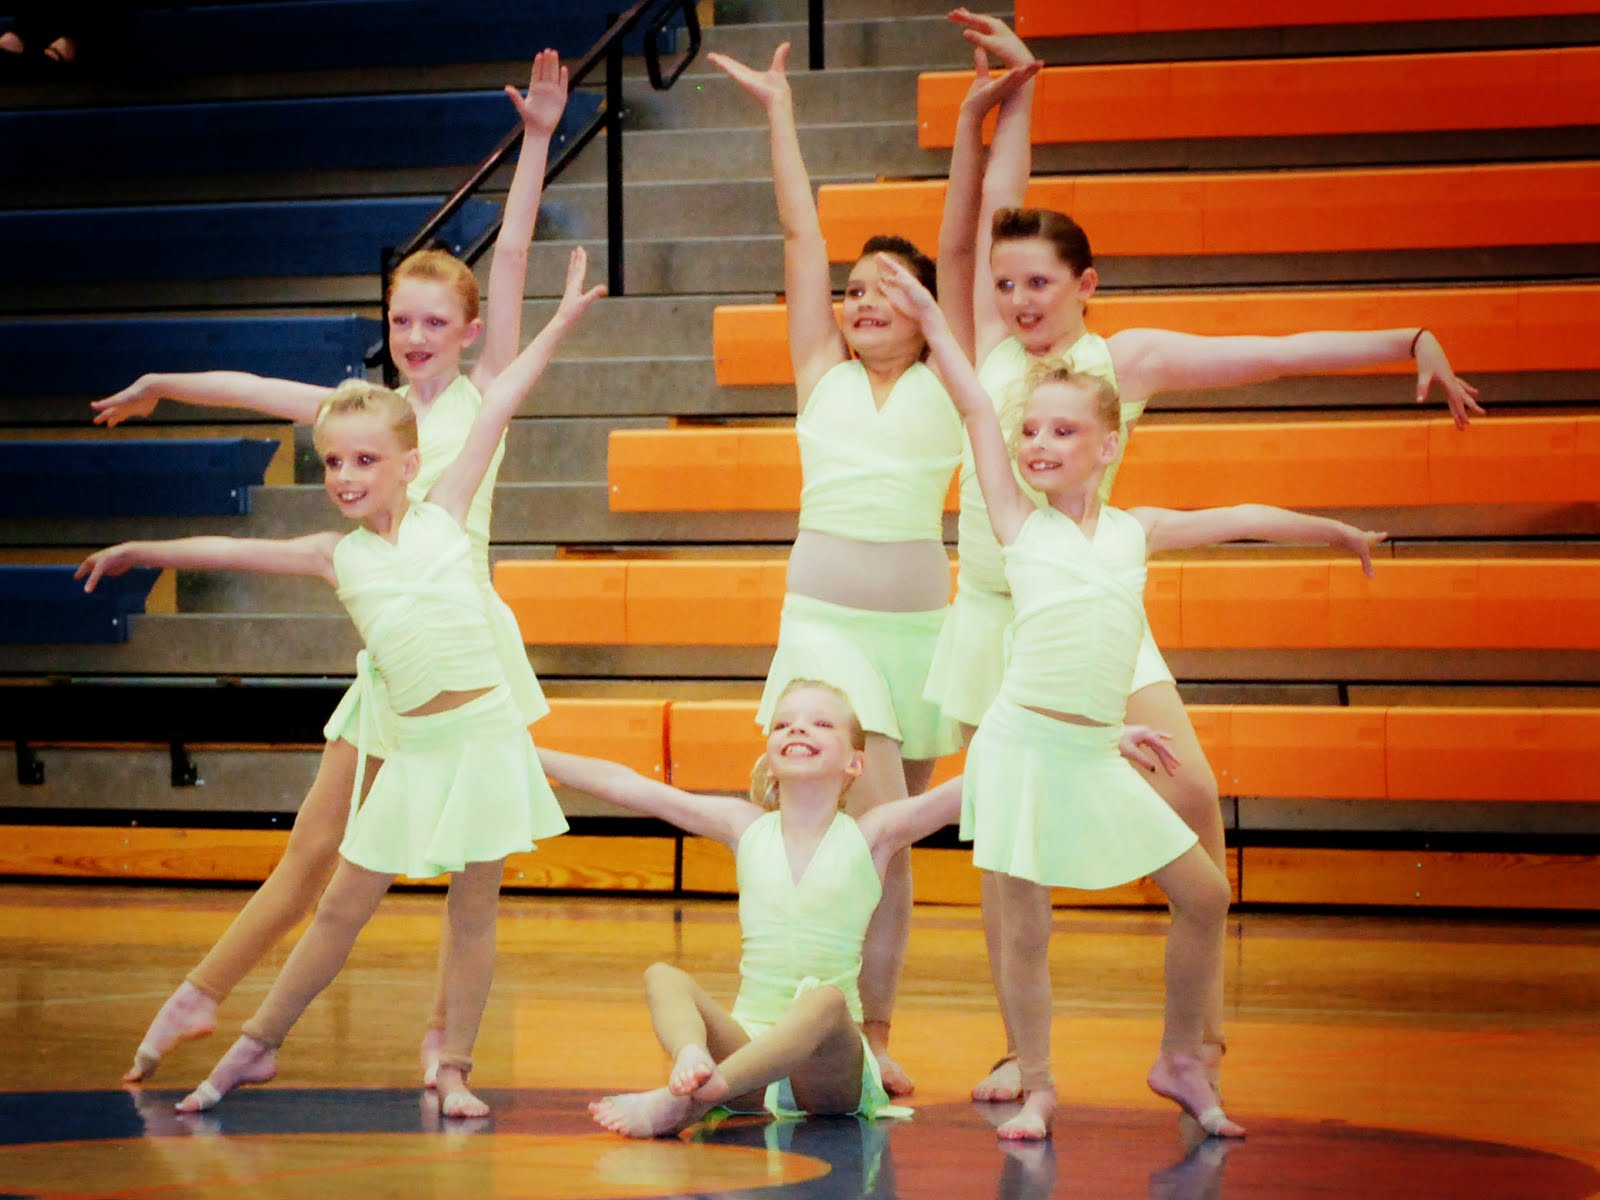 Second Time Dancewear Darling Mint Green Two Piece Dance